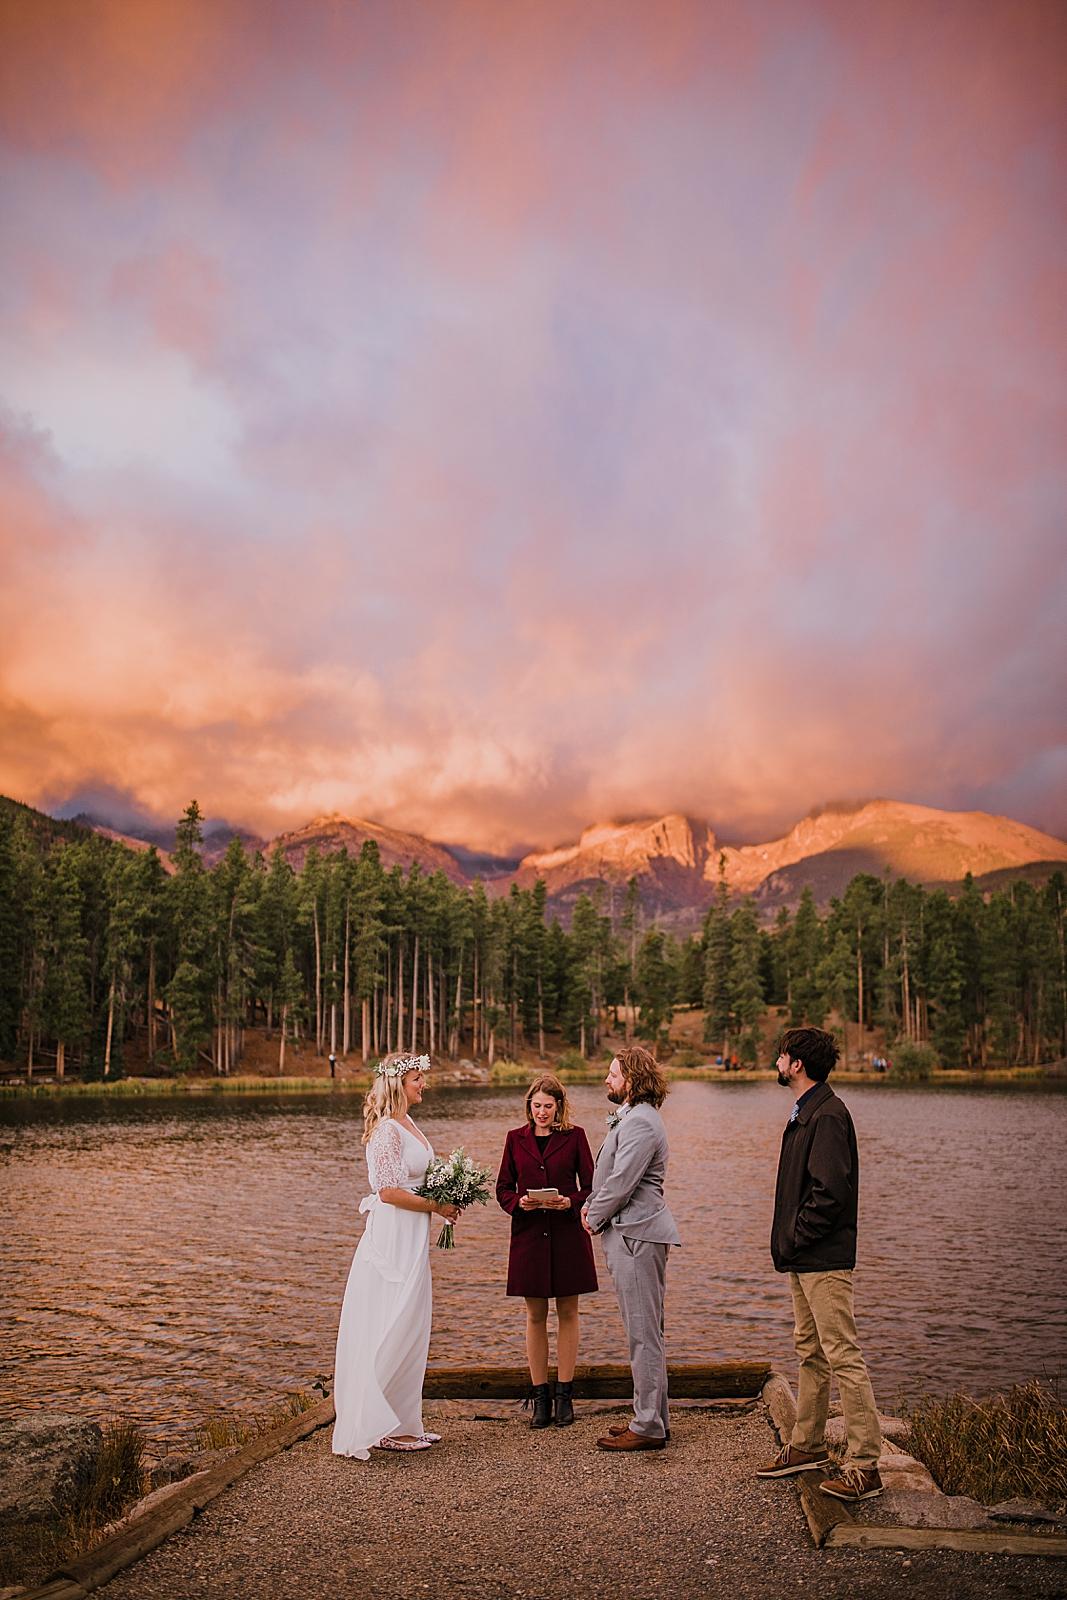 sprague lake elopement ceremony, sunrise elopement, colorado elopement, sprague lake elopement, sprague lake wedding, rocky mountain national park elopement, adventurous colorado hiking elopement